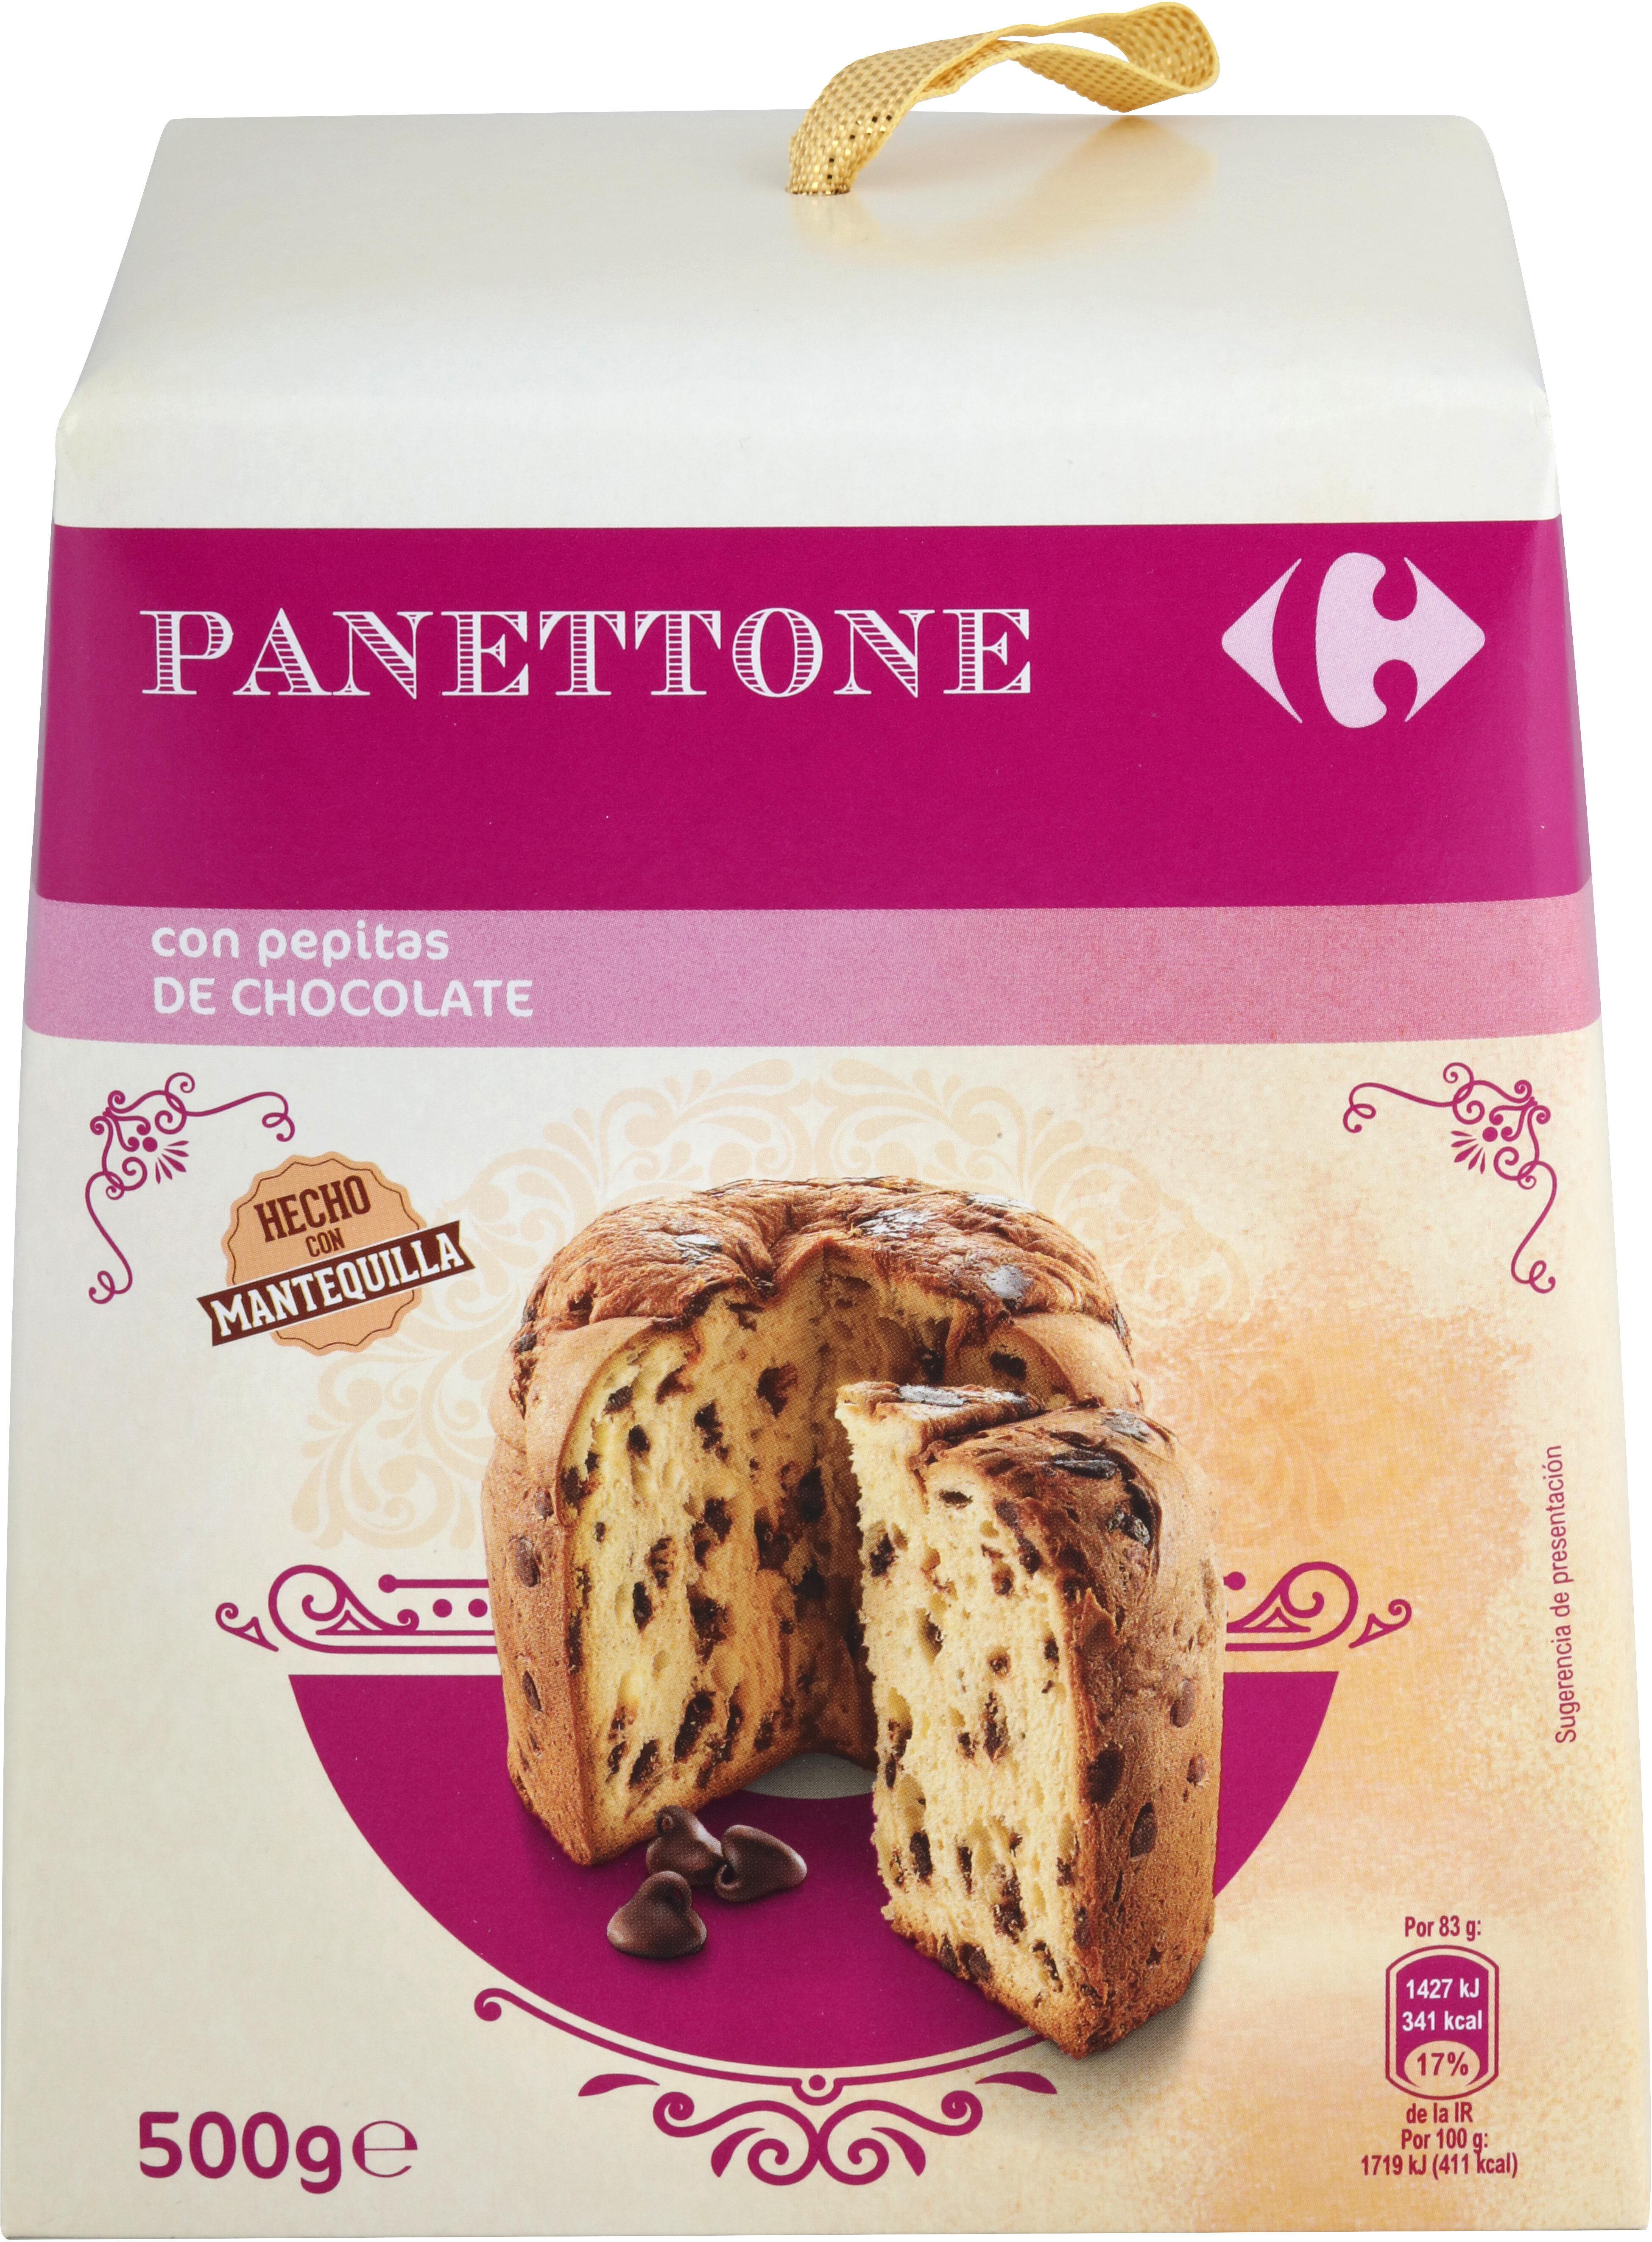 Panettone Con Pepitas De Chocolate - Product - es